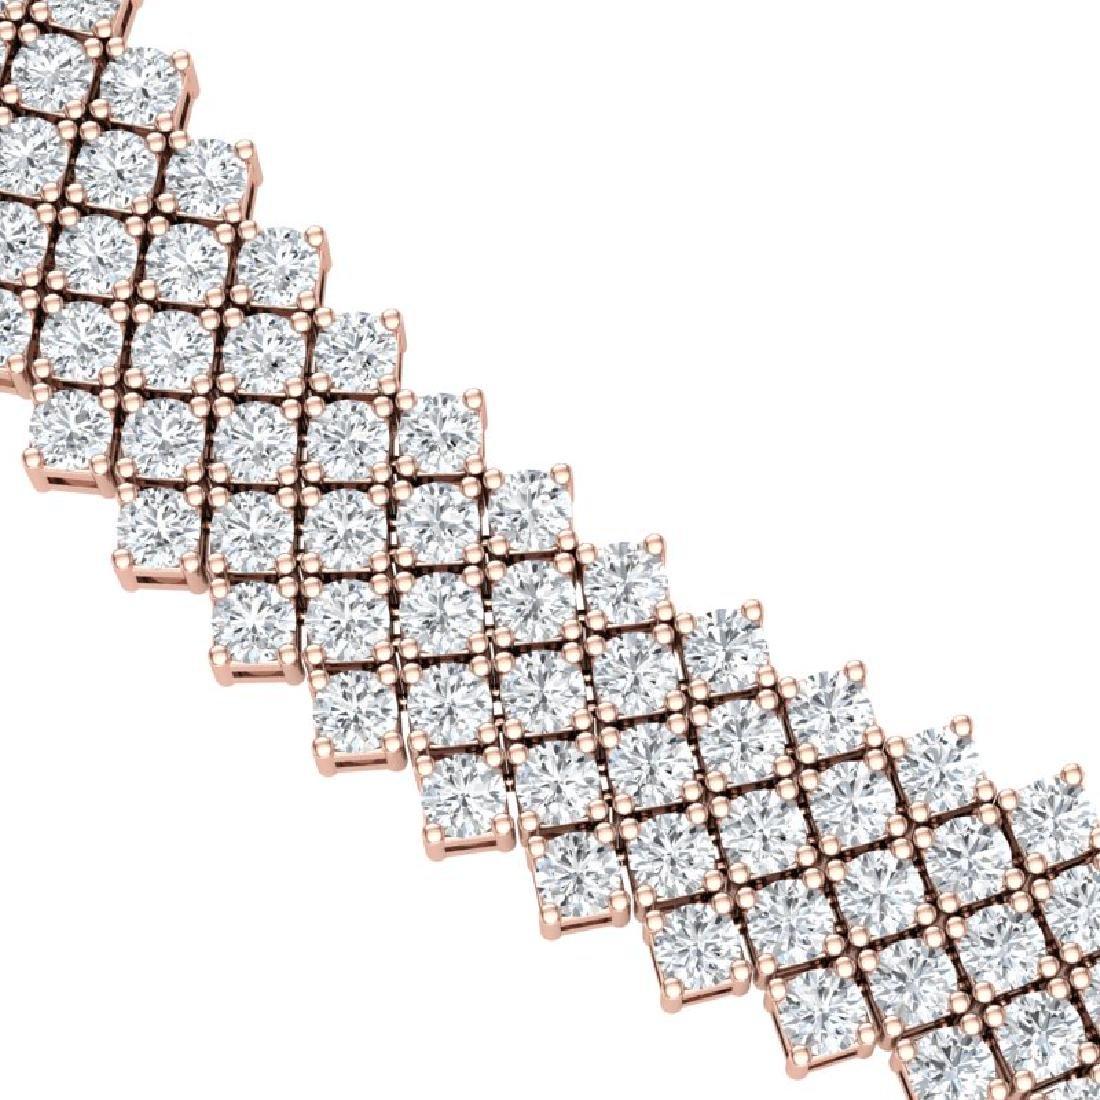 40 CTW Certified VS/SI Diamond Necklace 18K Rose Gold - 2